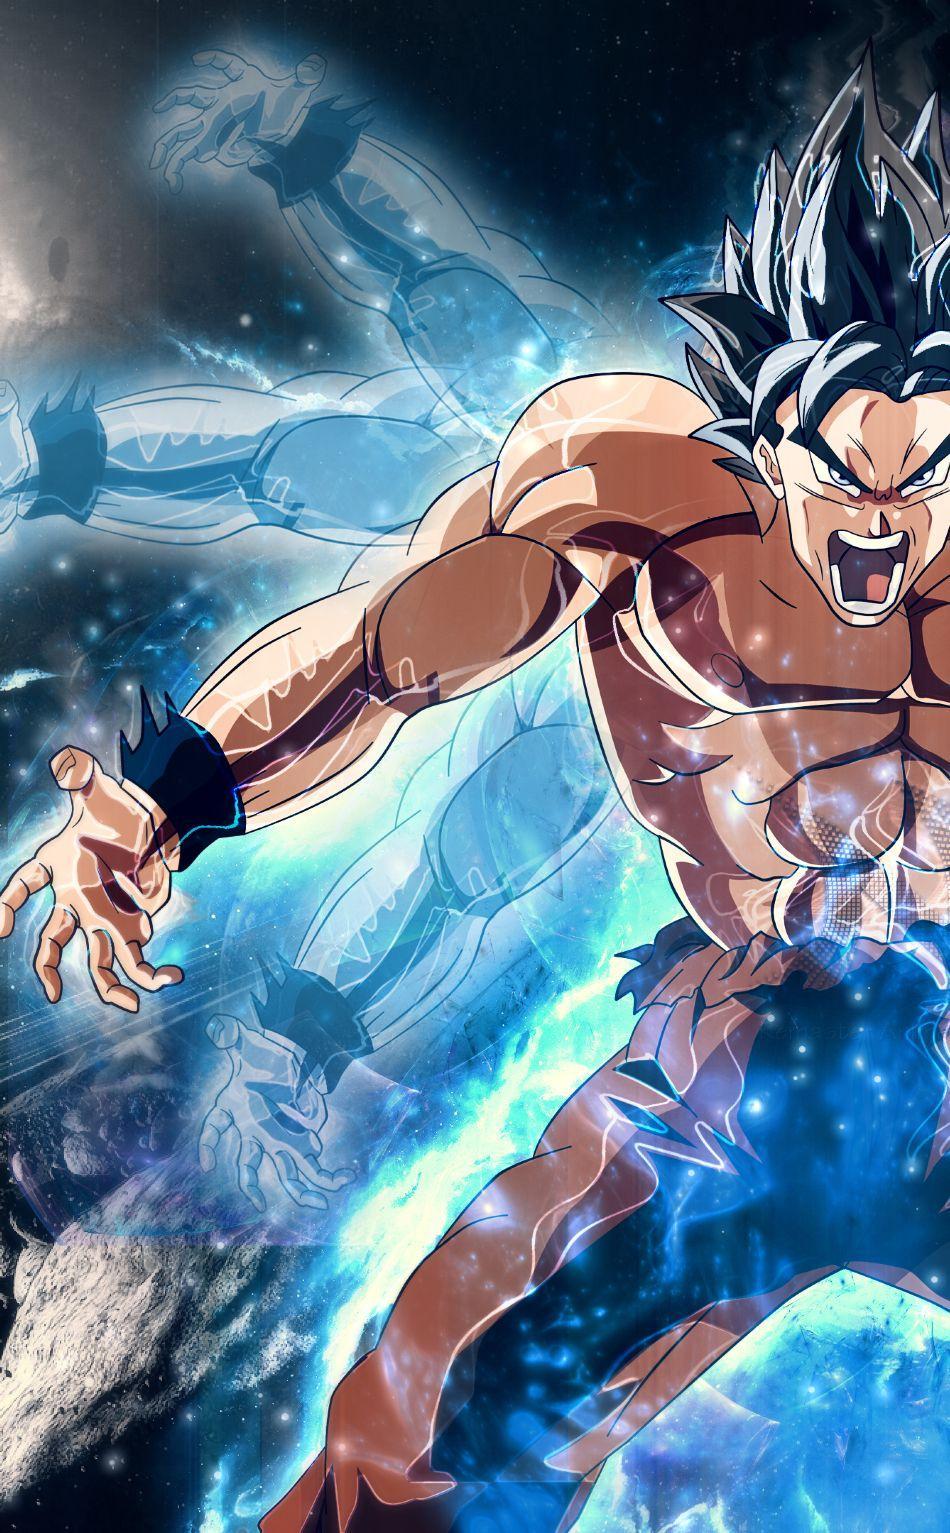 Goku Iphone Wallpapers Top Free Goku Iphone Backgrounds